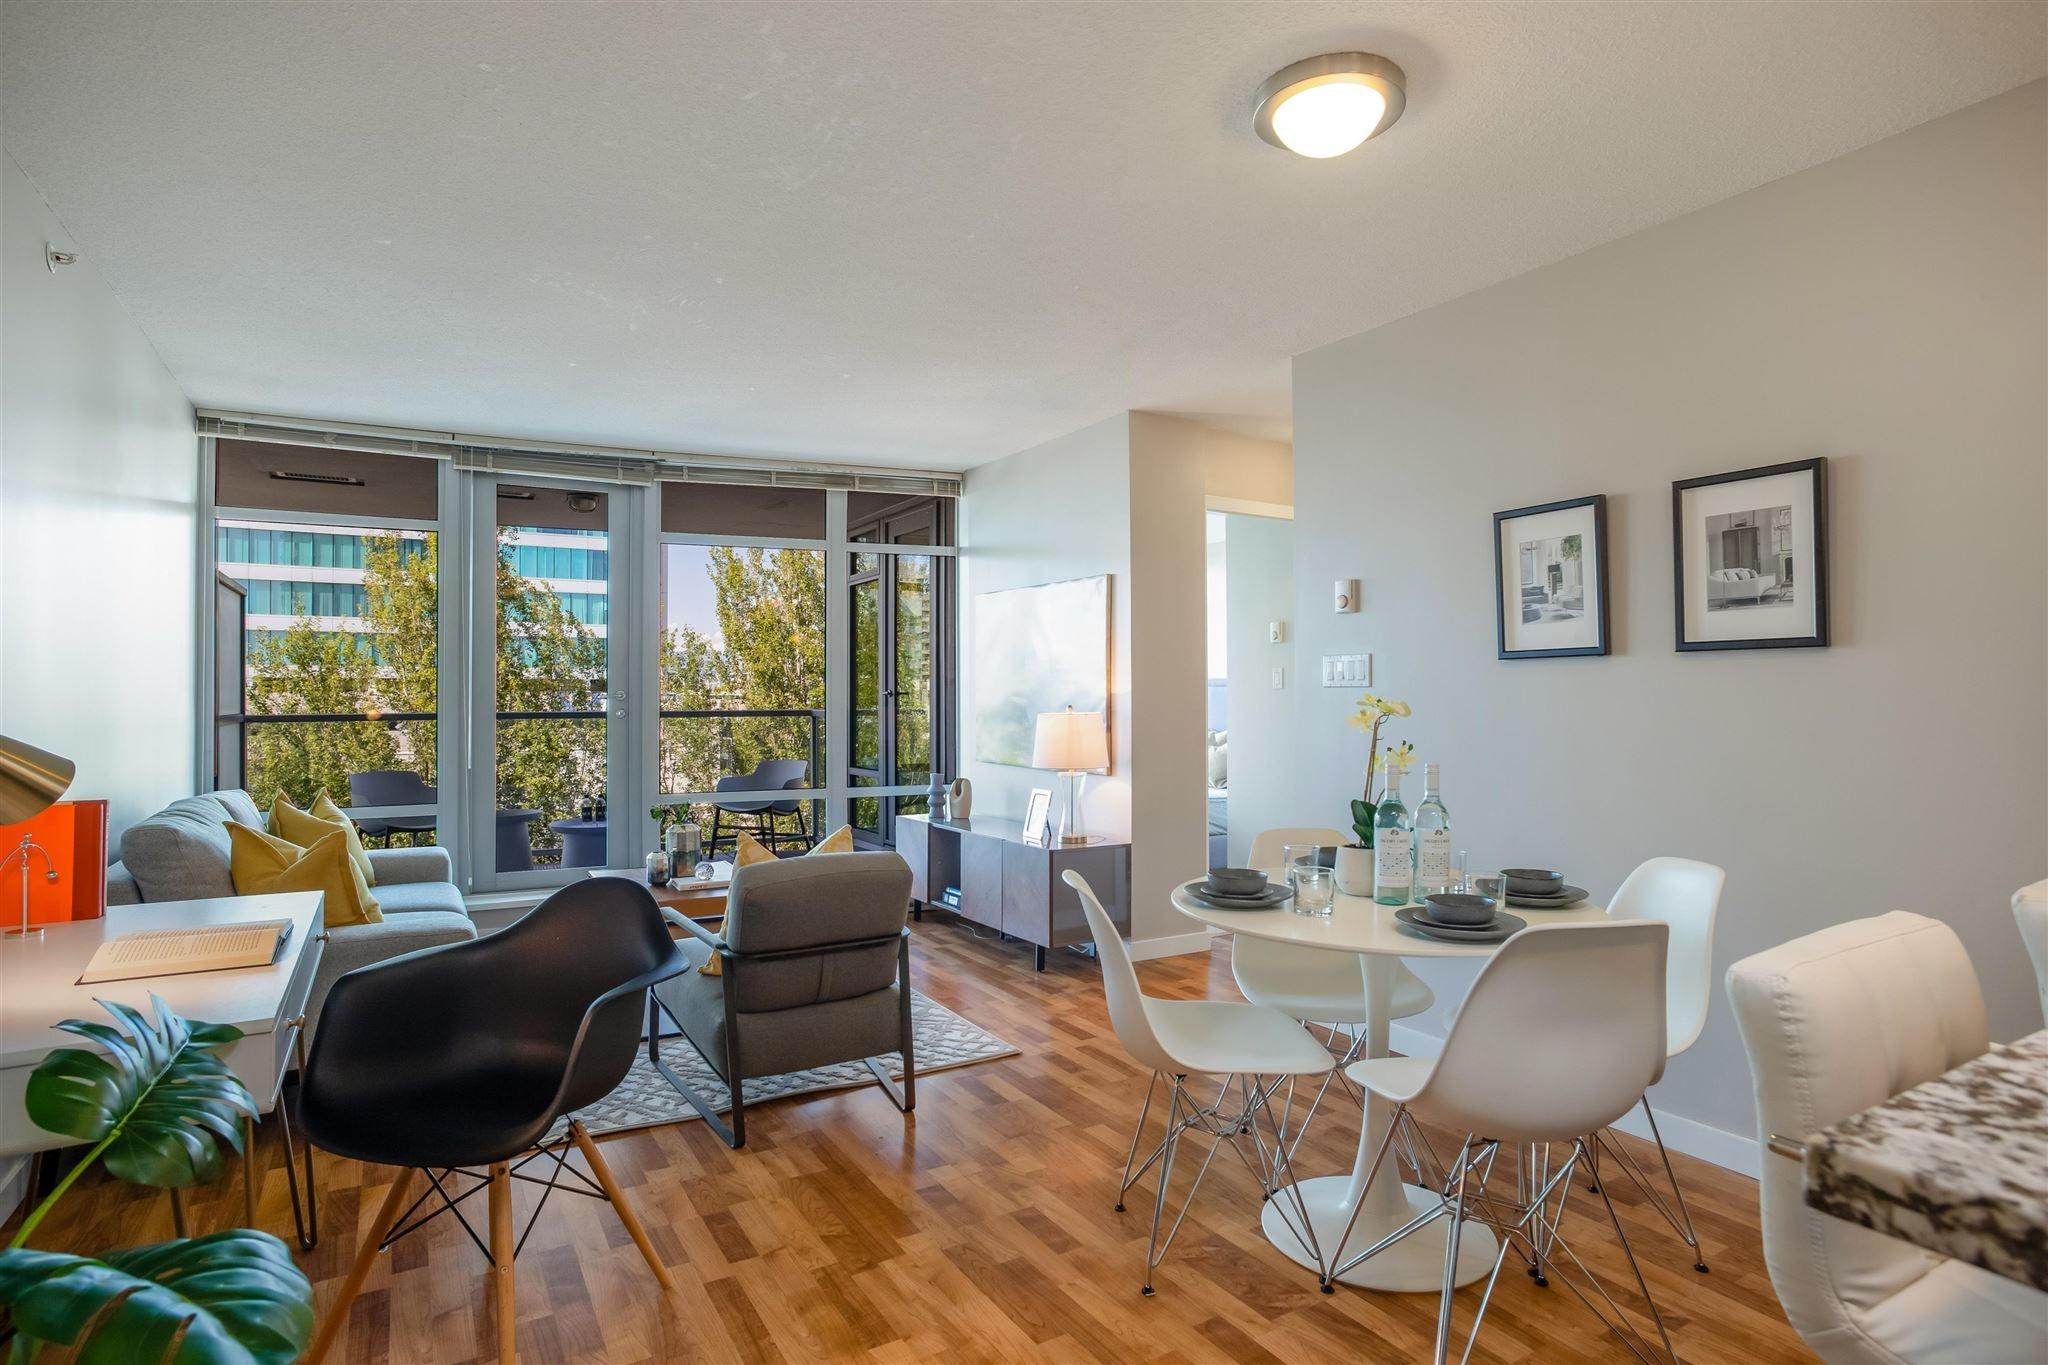 609 7888 SABA ROAD - Brighouse Apartment/Condo for sale, 2 Bedrooms (R2605298)